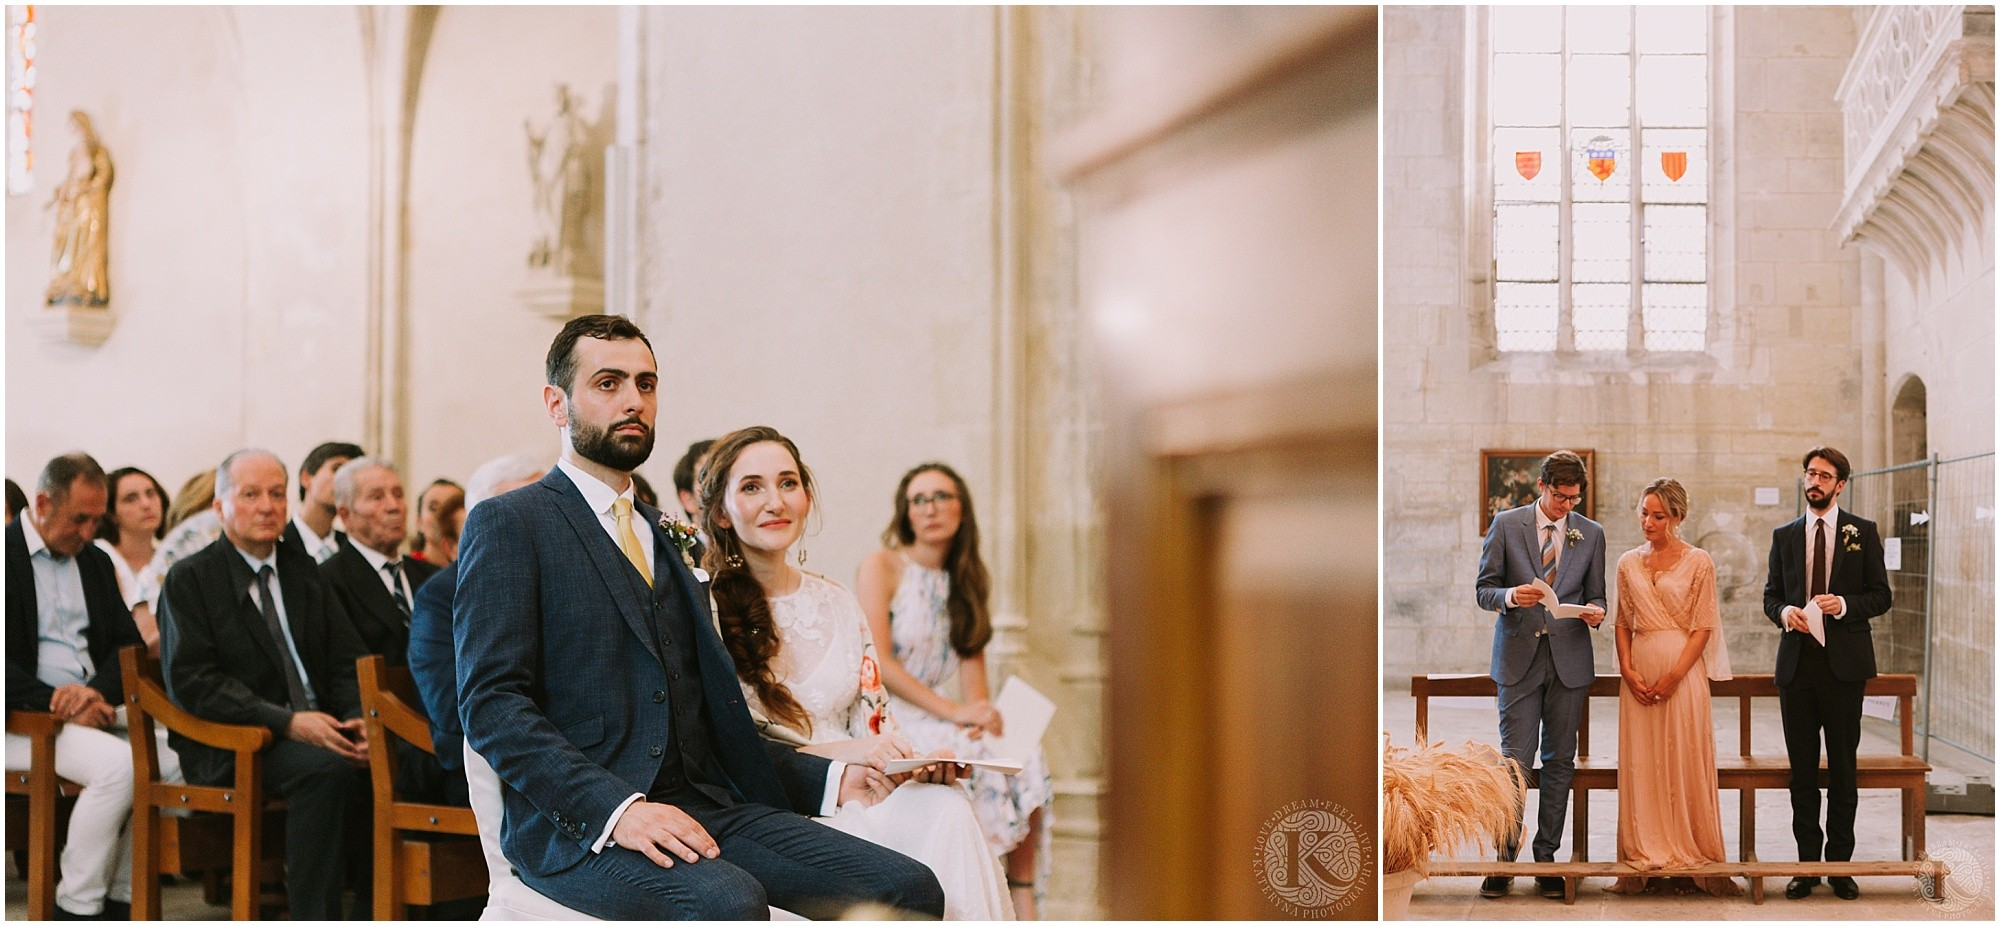 Kateryna-photos-photographe-mariage-vaucluse-provence-avignon-ferme-st-hugues_0031.jpg